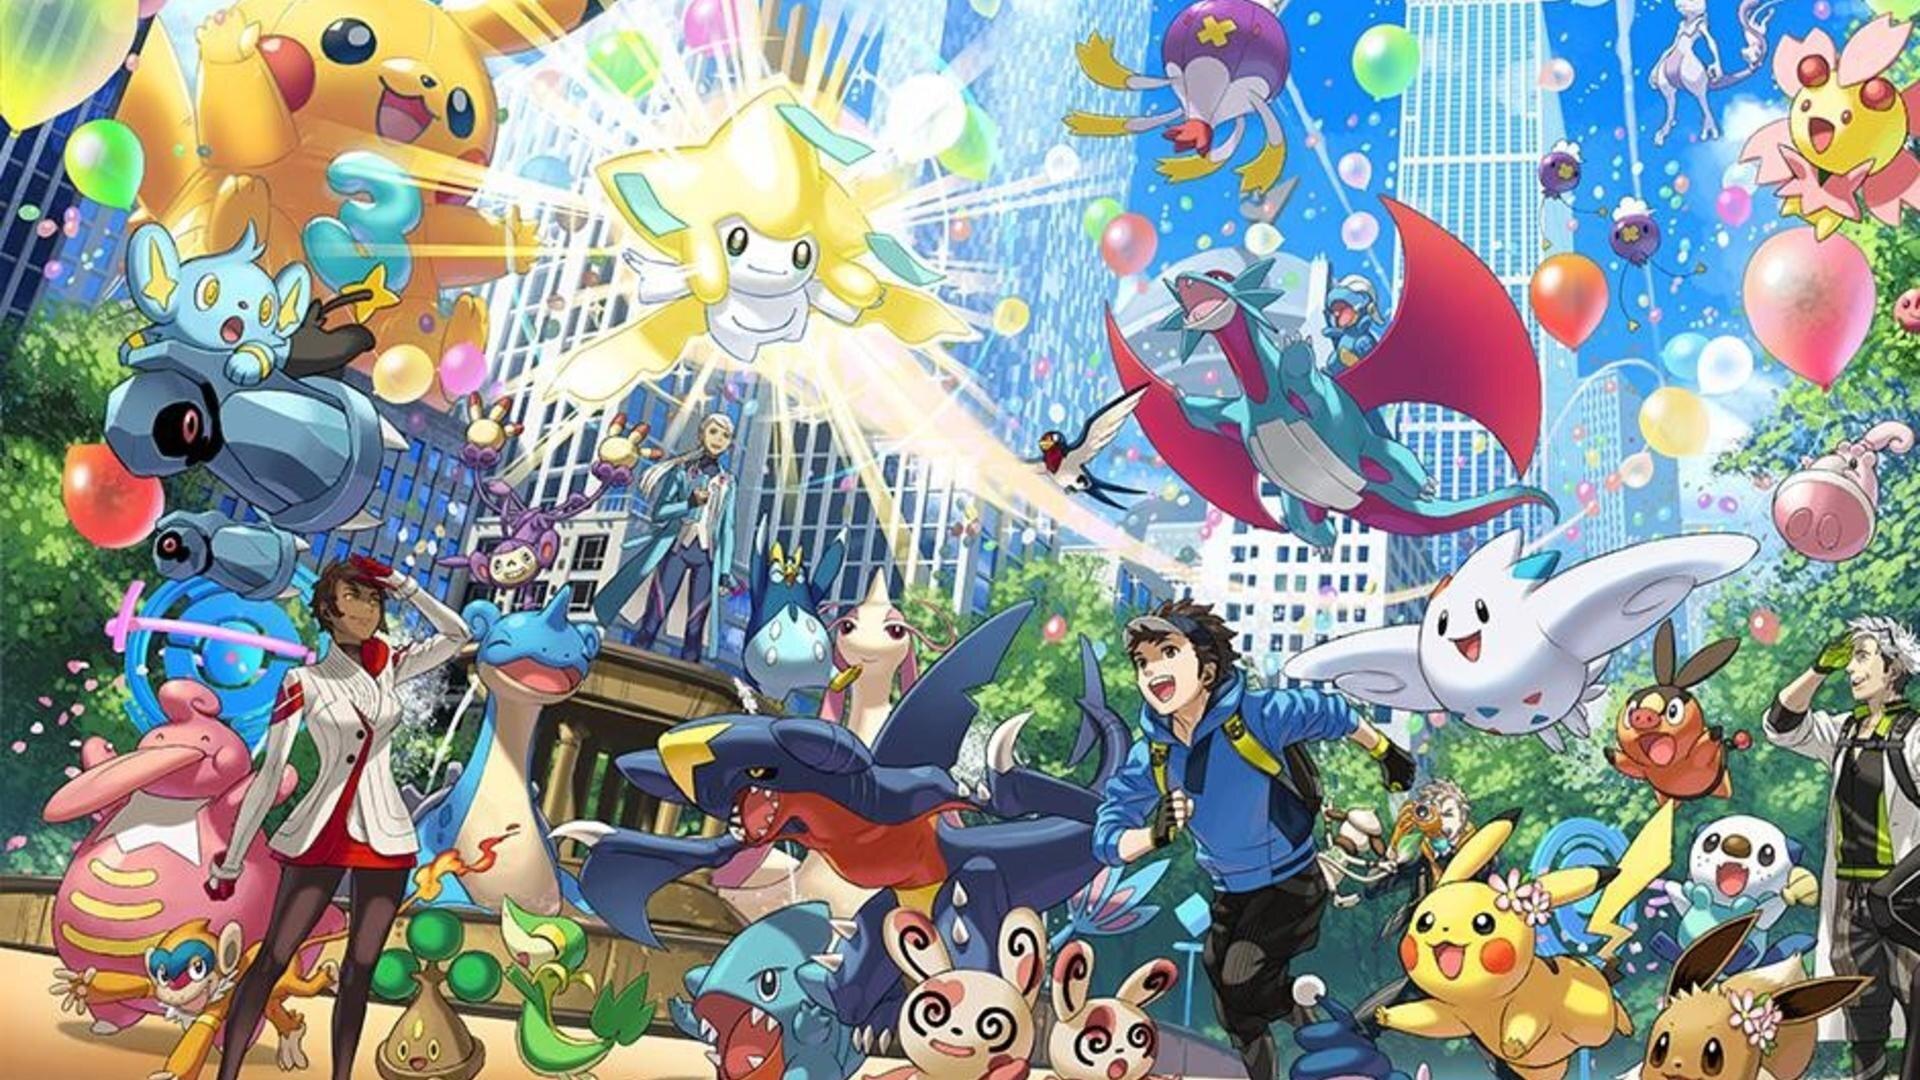 pokemon-go-gen-5-list-gen-5-teaser-unova-region-detailed.jpg